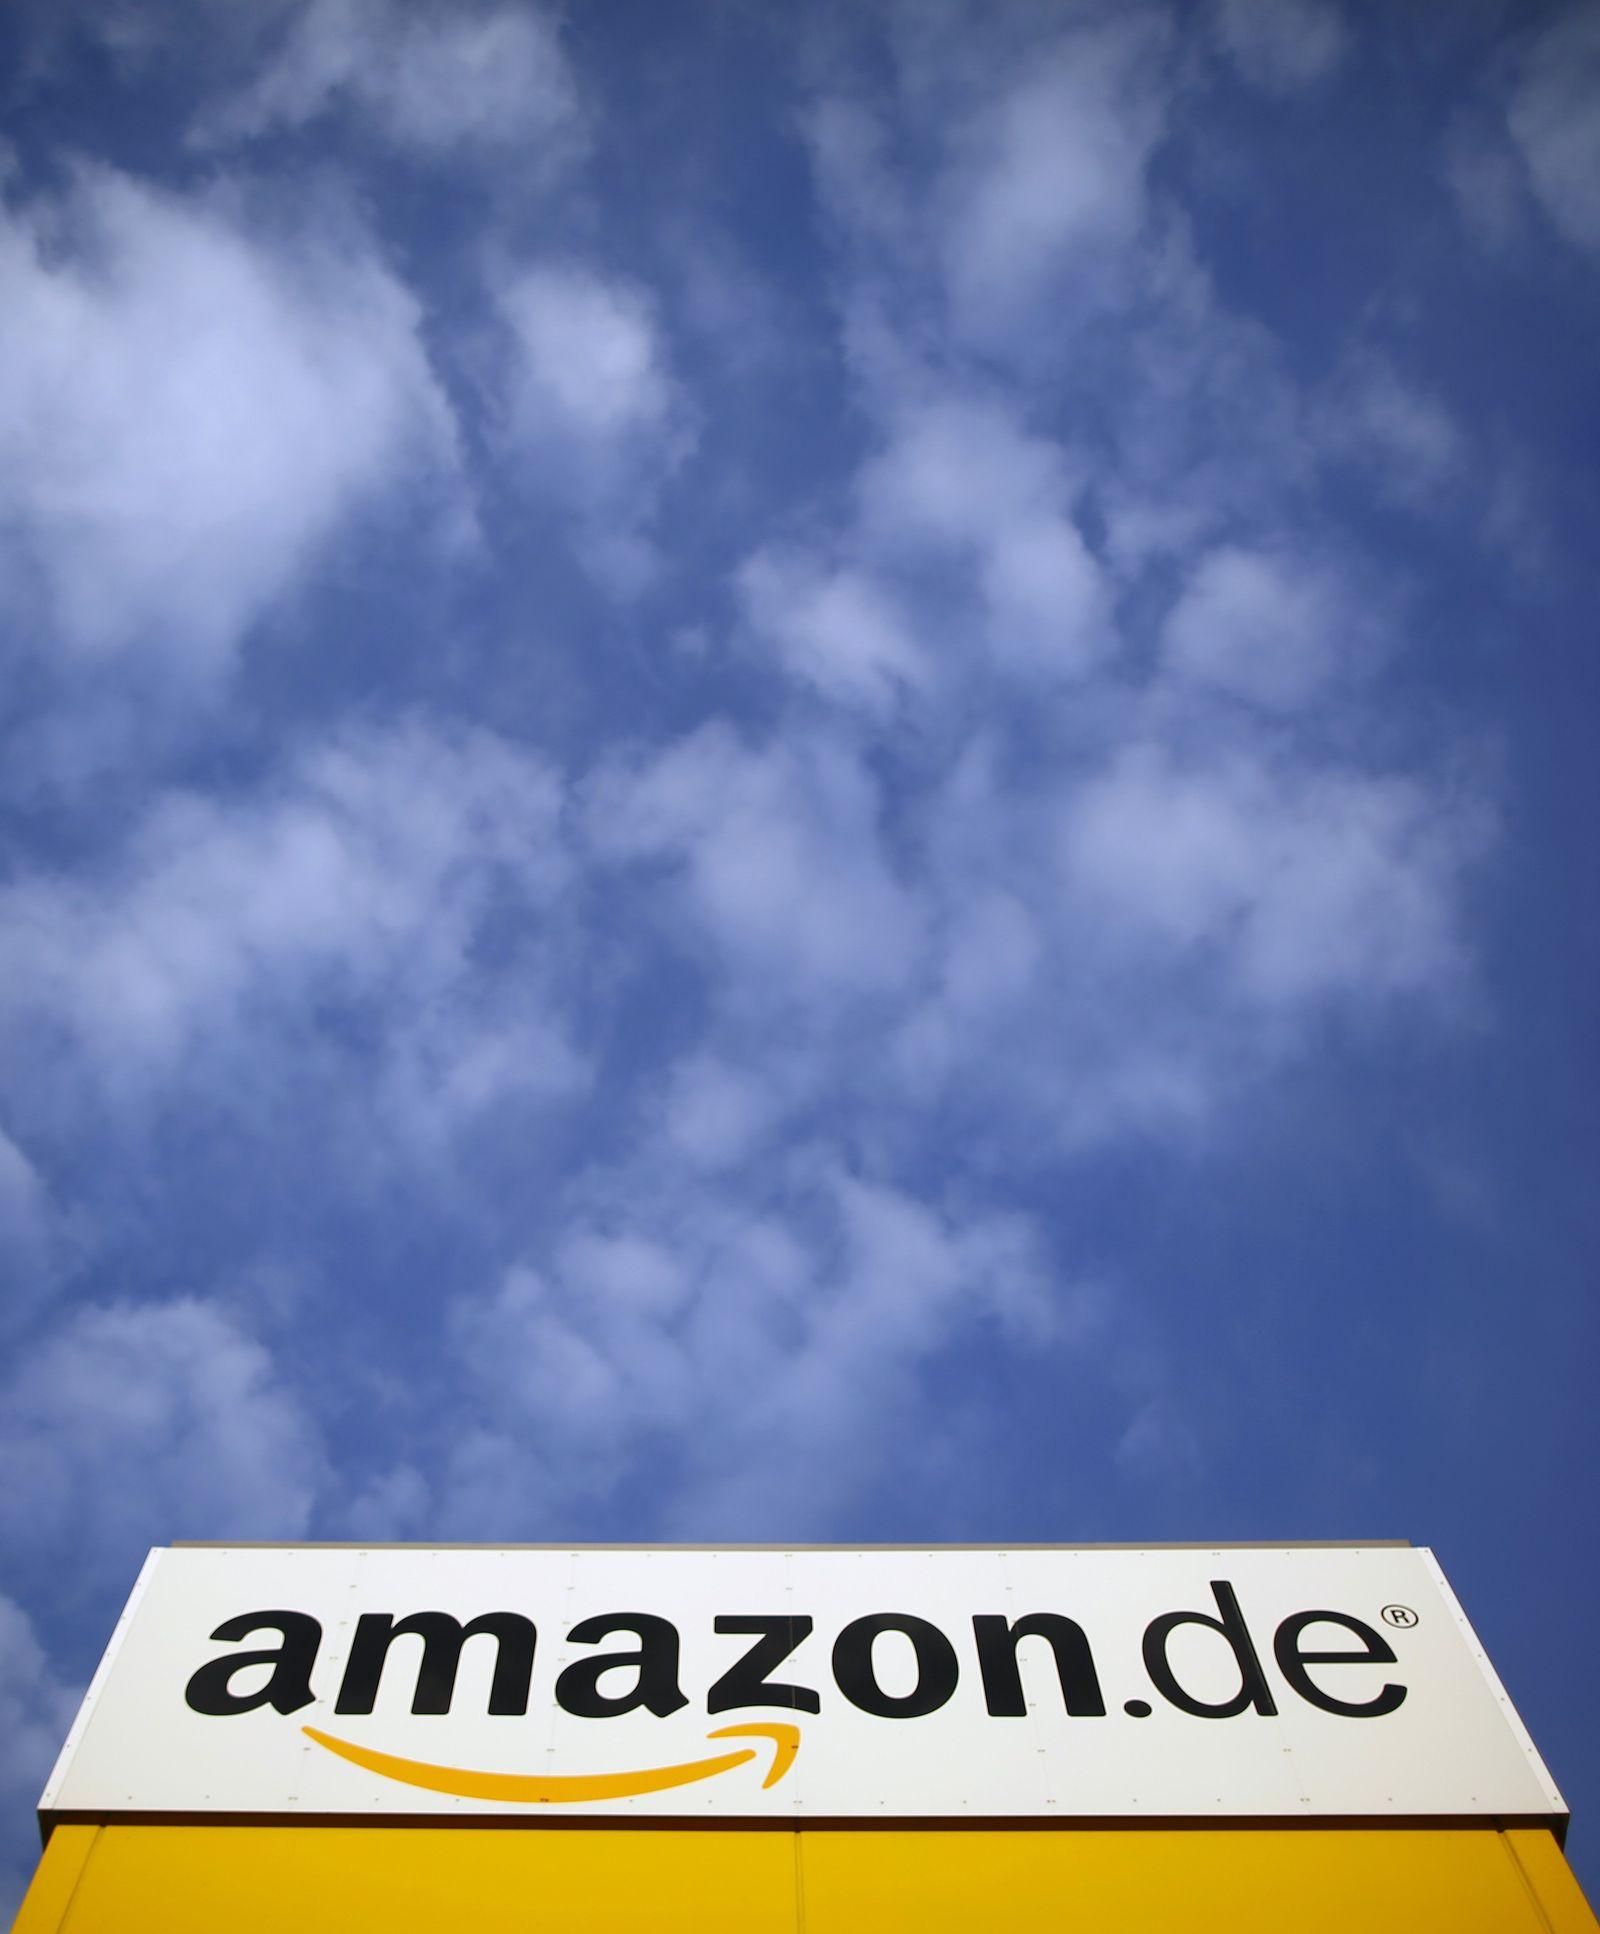 Amazon Firmenlogo